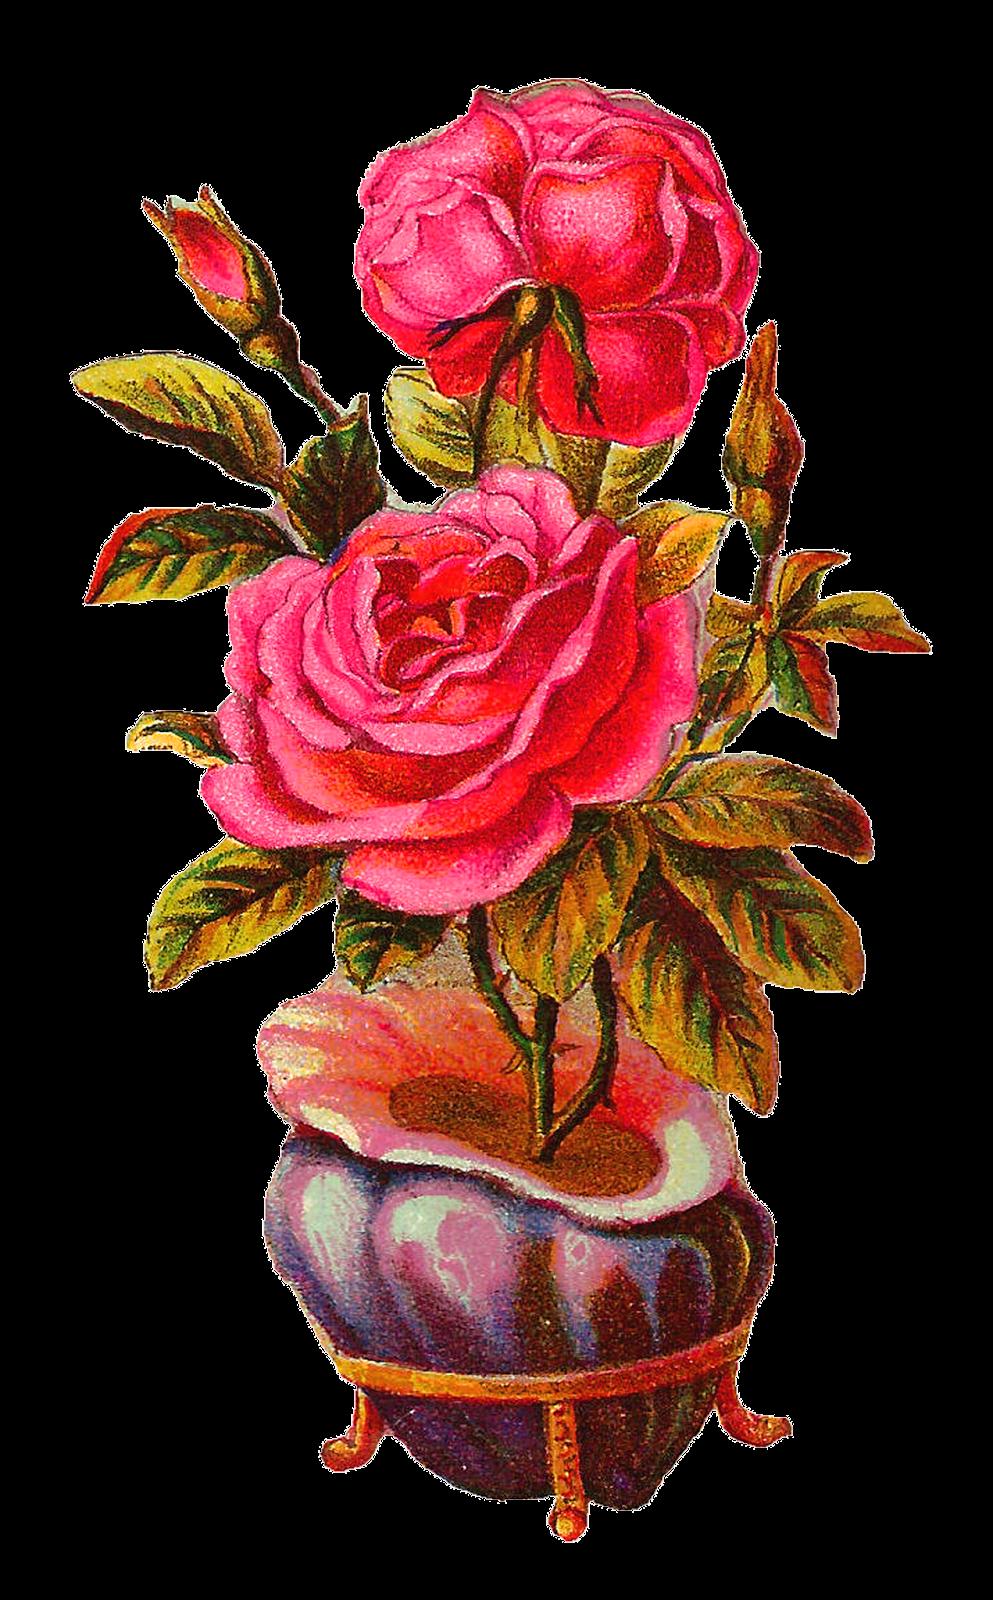 993x1600 Antique Images Botanical Vintage Download Pink Rose With Shell